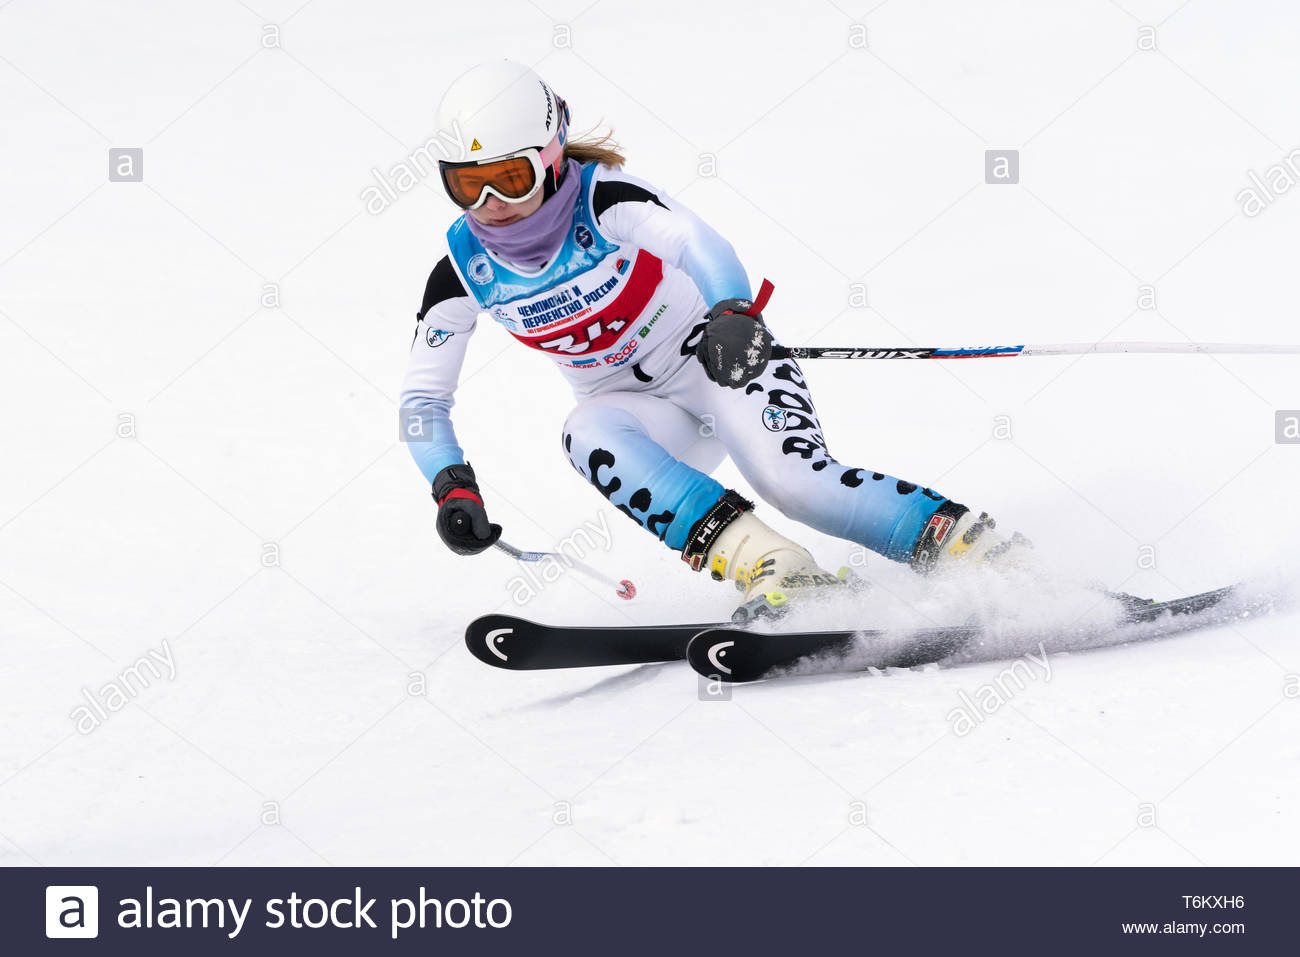 KAMCHATKA PENINSULA, RUSSIA - APR 2, 2019: Mountain skier Kazakova Vitalia (Murmansk) skiing down mount slope. Russian Women's Alpine Skiing Cup Inter - Stock Image